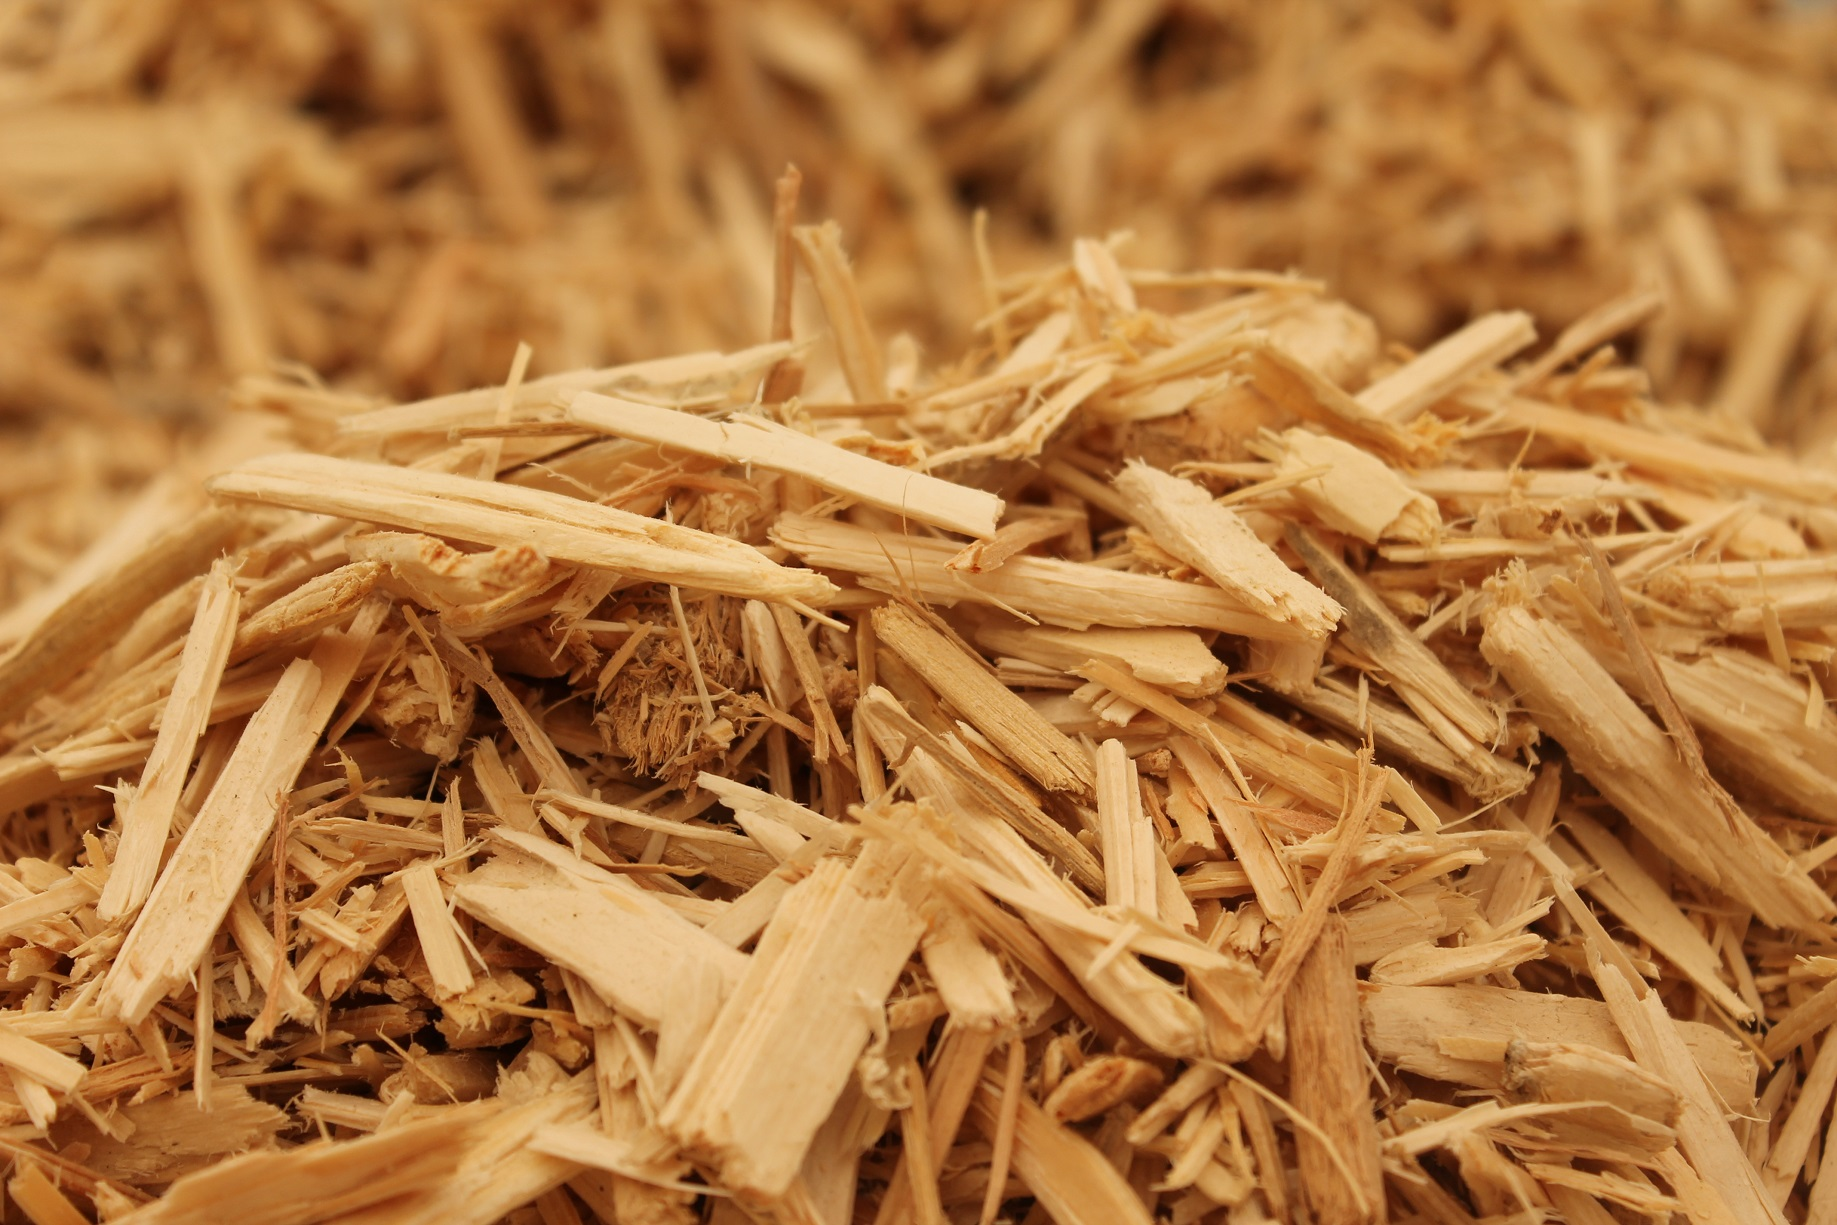 Waste Wood?